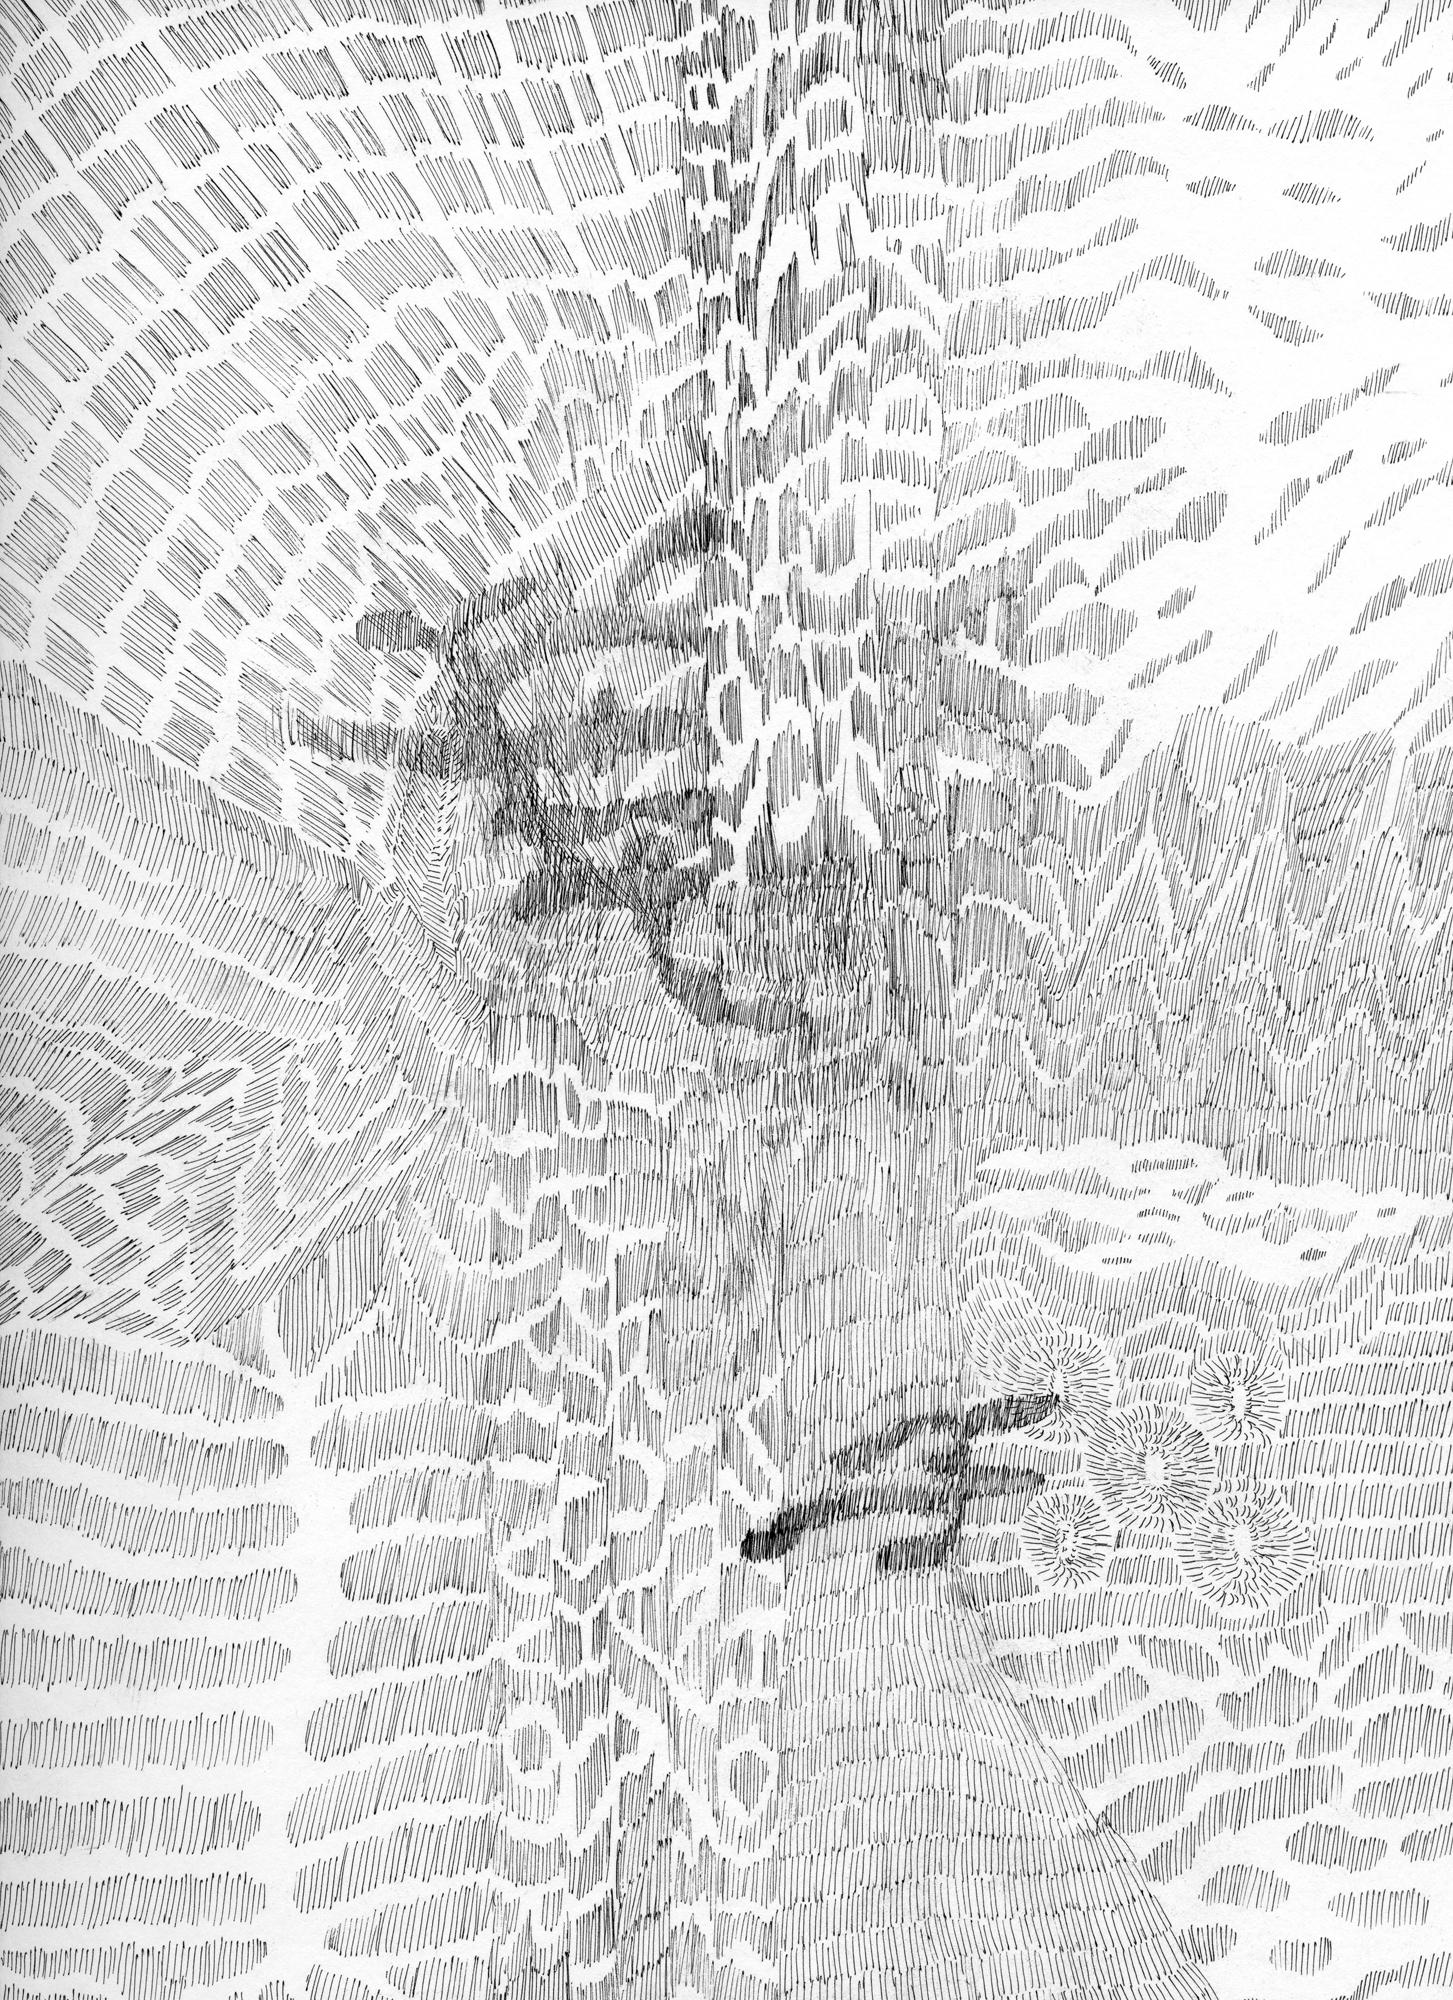 Untitled (Flux 05.08) , 2019 Ink on paper 30.4 cm x 22.8 cm